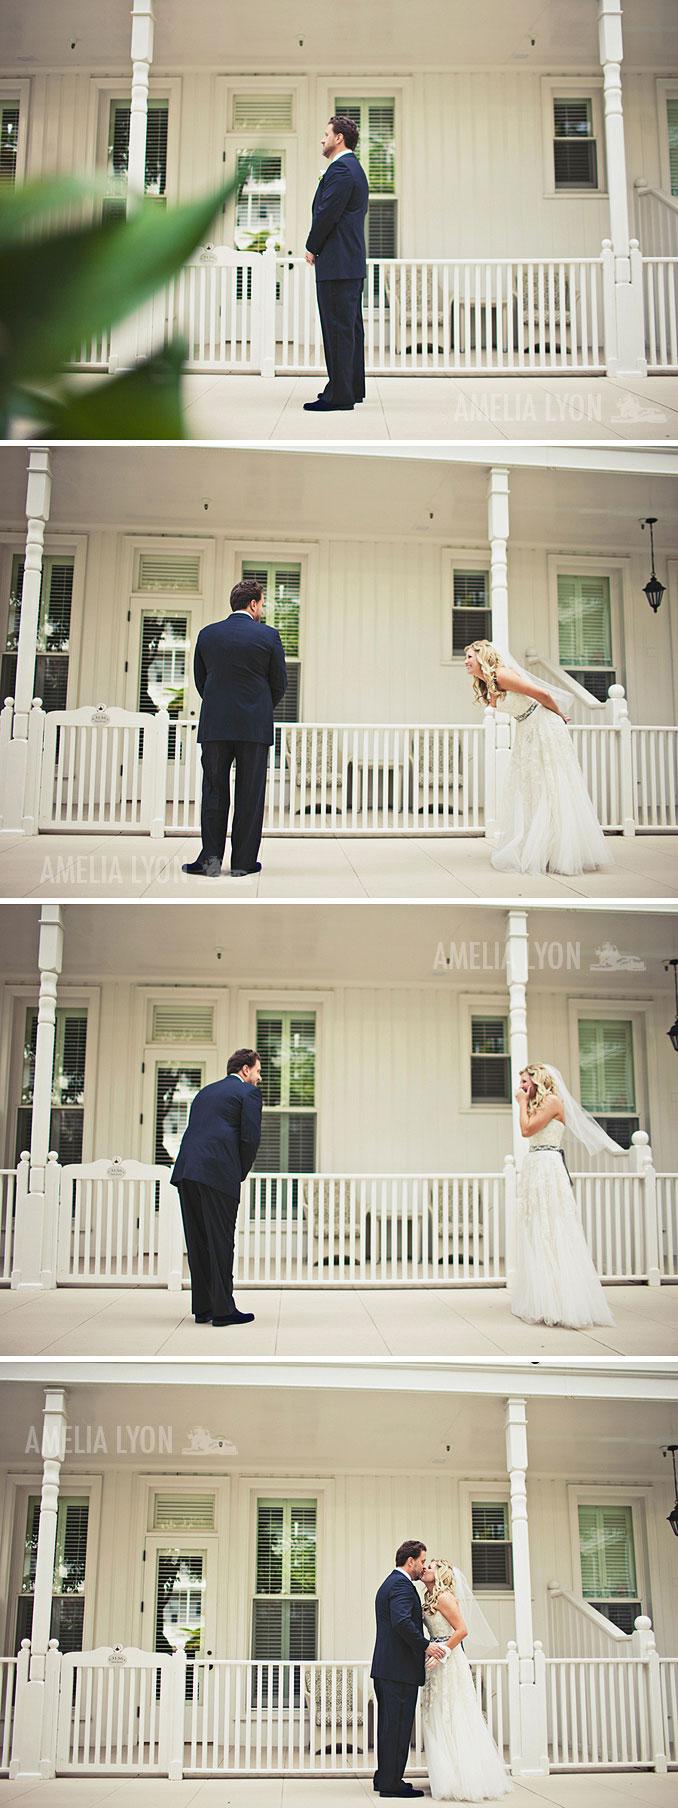 sandiegowedding_hoteldel_coronado_amelialyonphotography_wedding_kellyandrob005.jpg